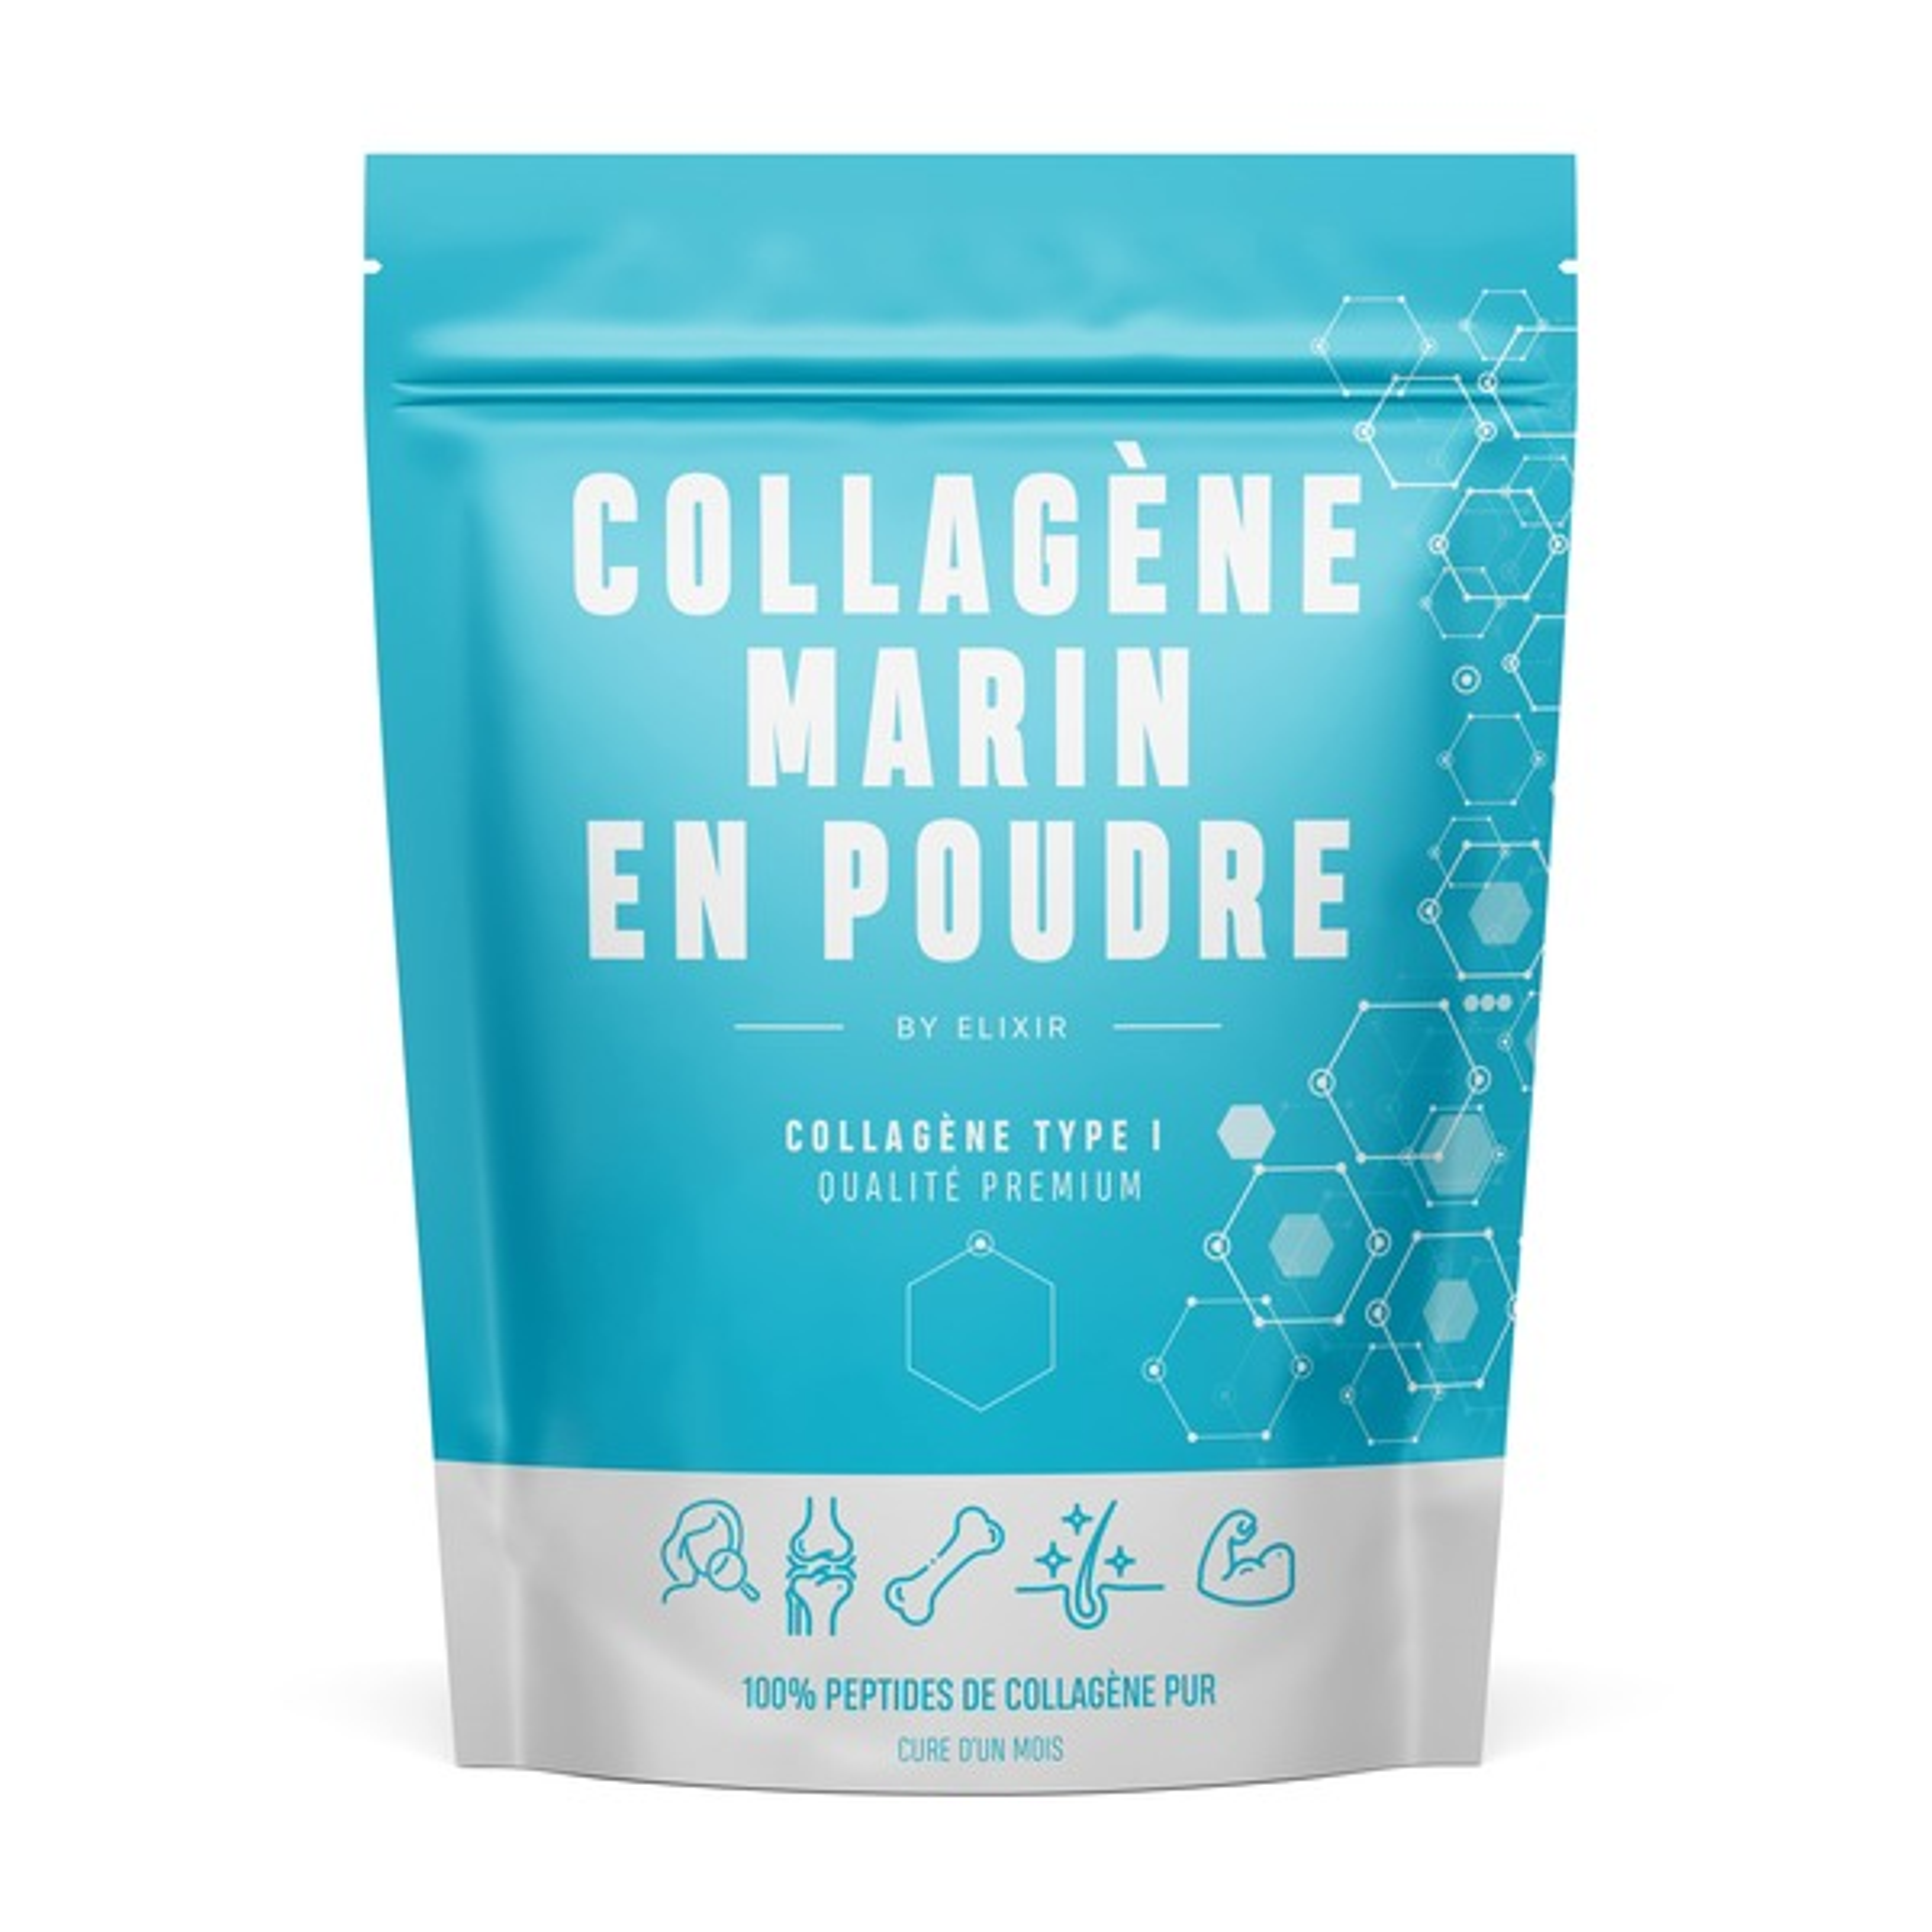 By Elixir - Collagène Marin By Elixir - 310g - Cure d'un Mois